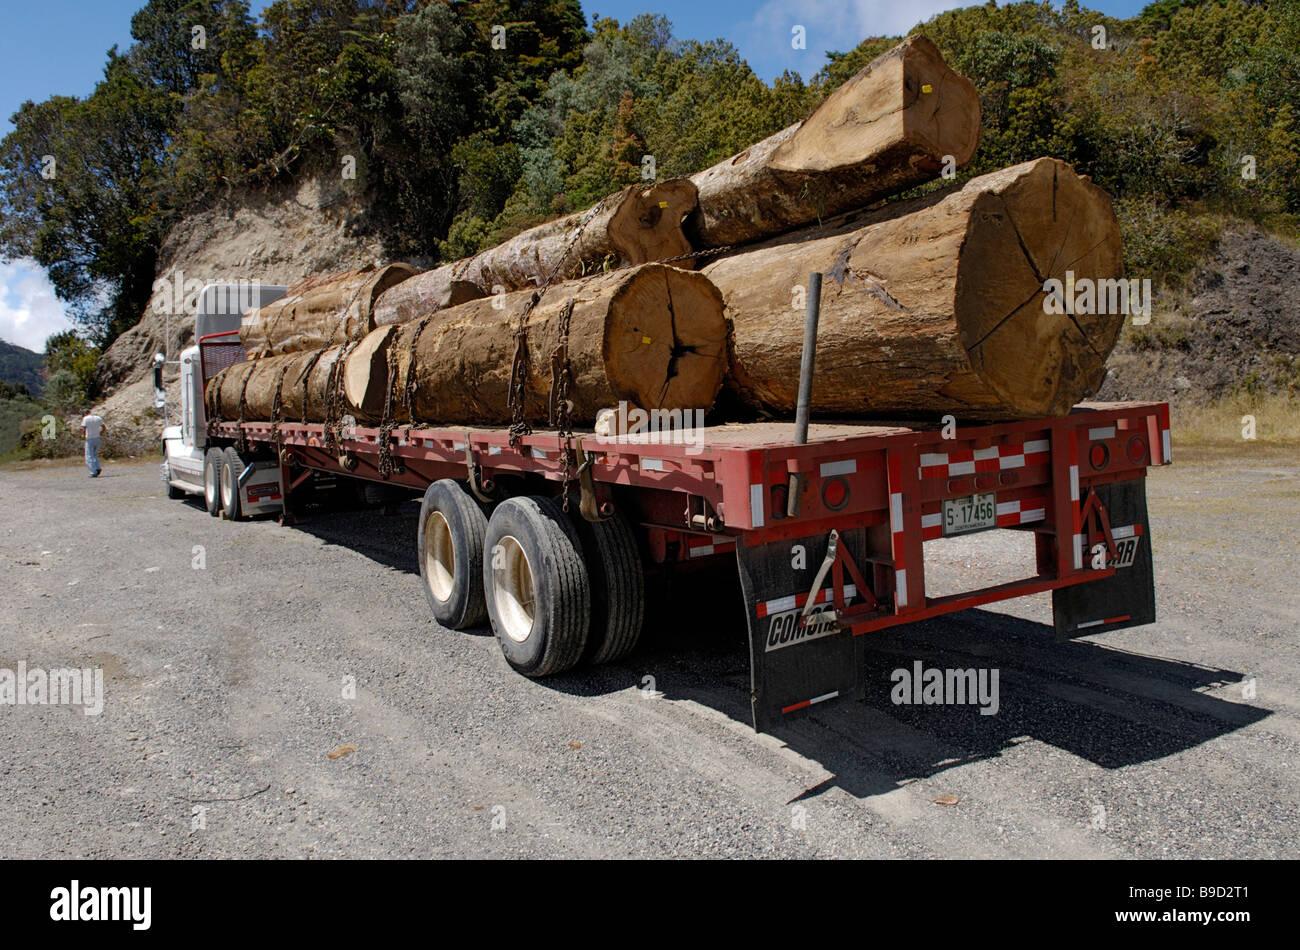 Logging truck, Costa Rica - Stock Image